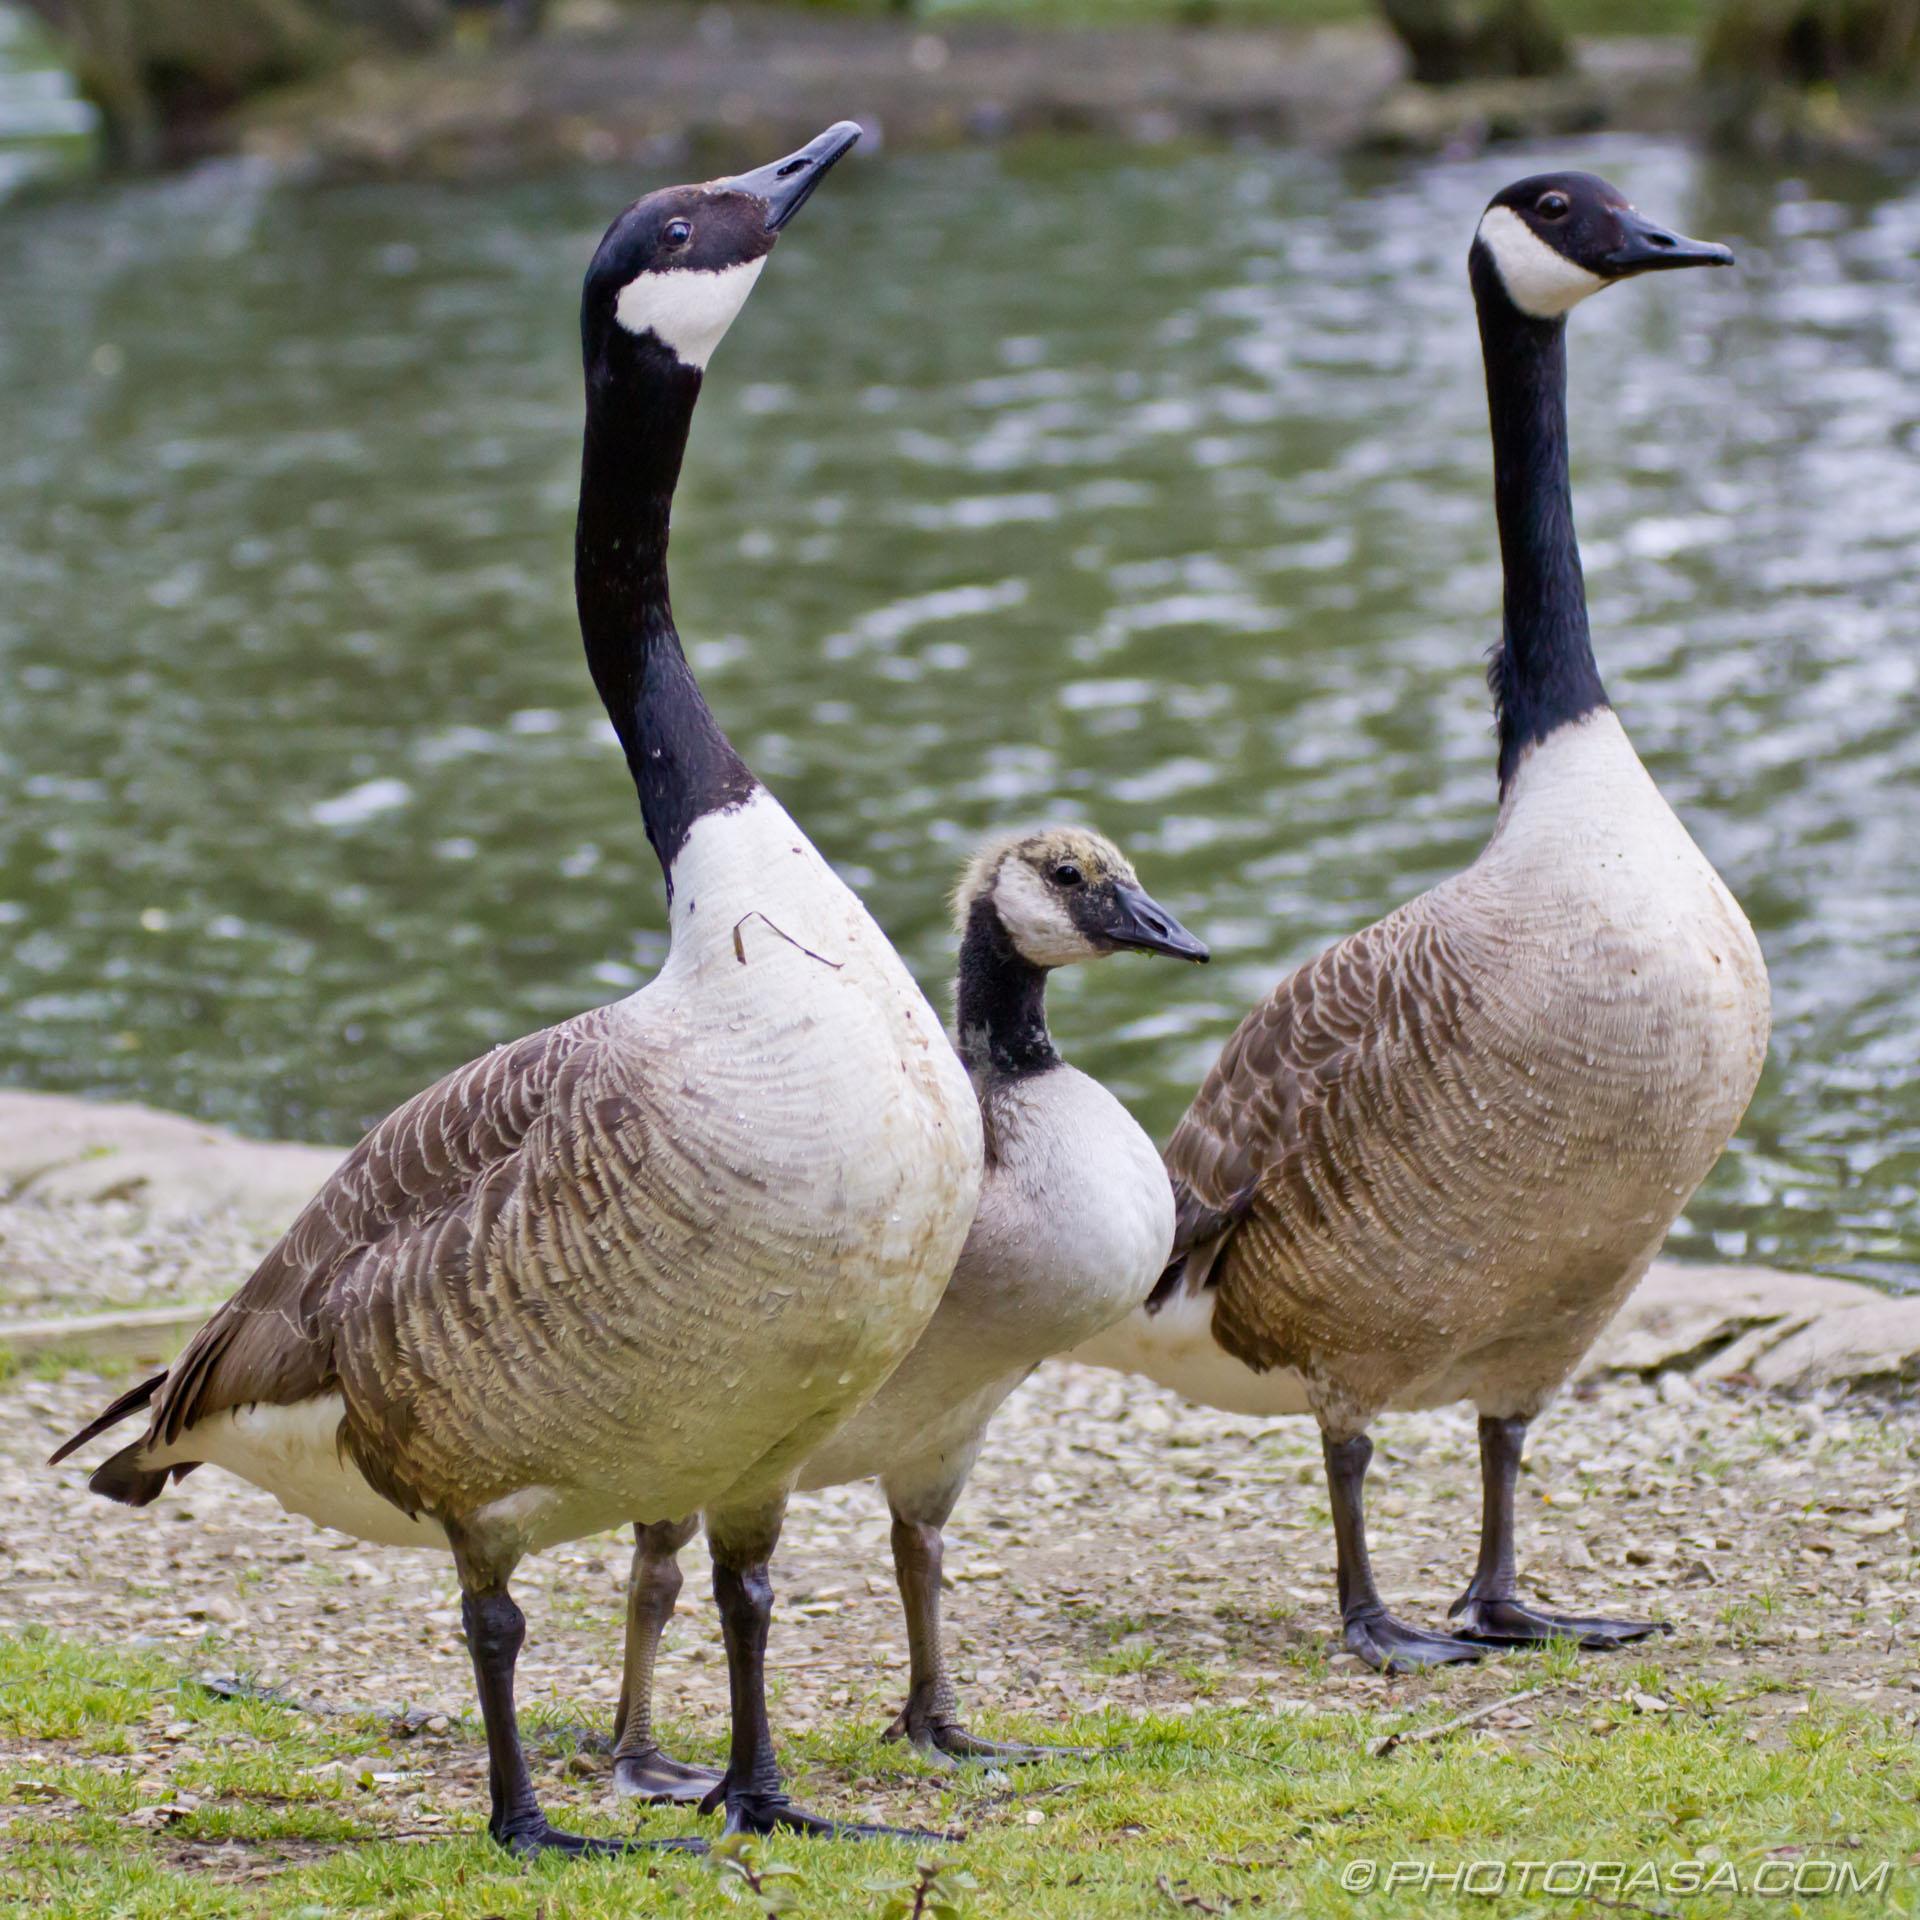 http://photorasa.com/gaggle-geese/the-goose-family/